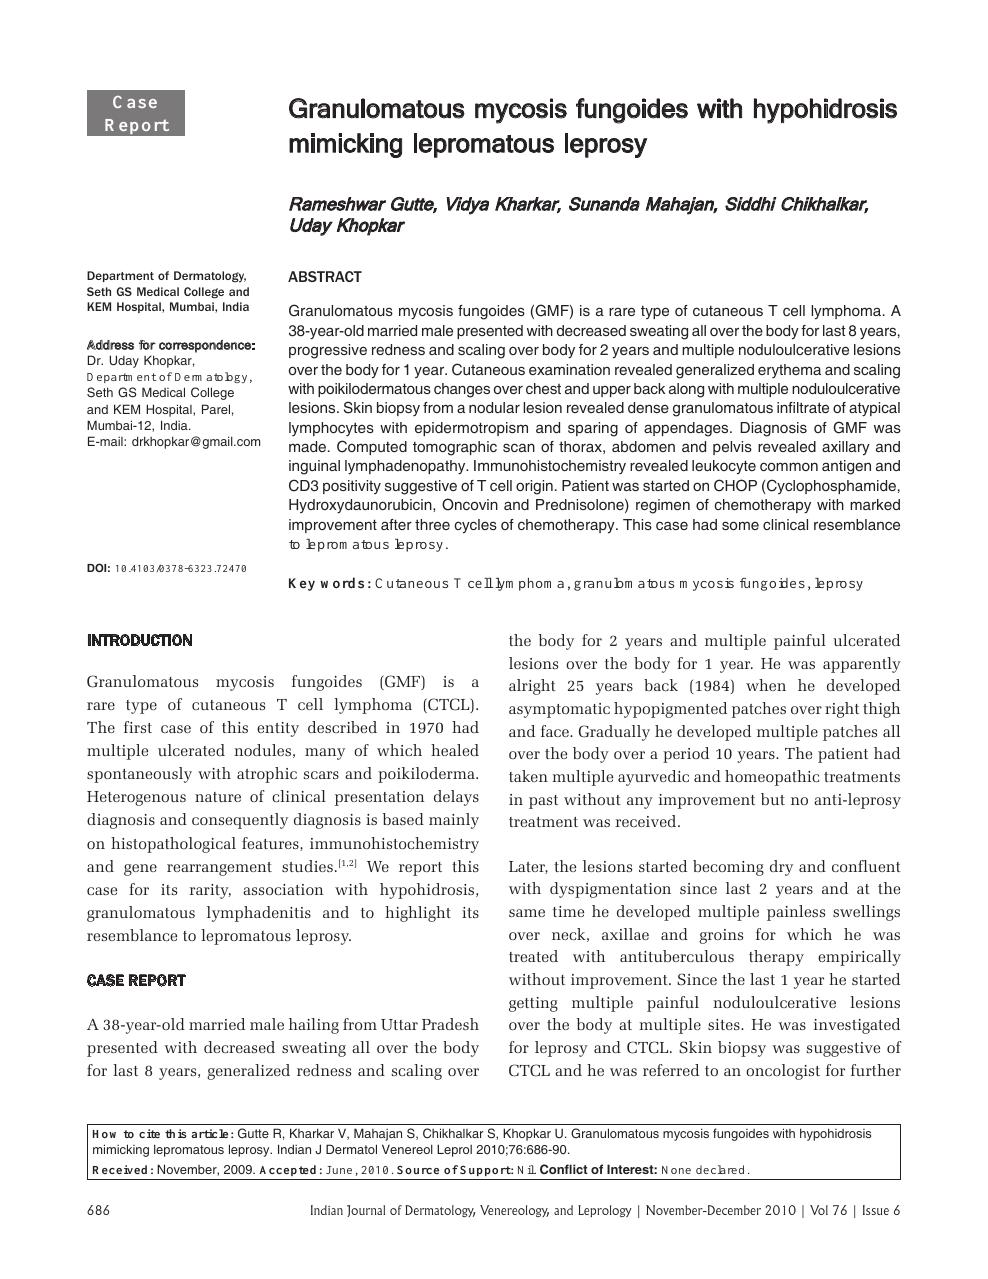 Granulomatous mycosis fungoides with hypohidrosis mimicking